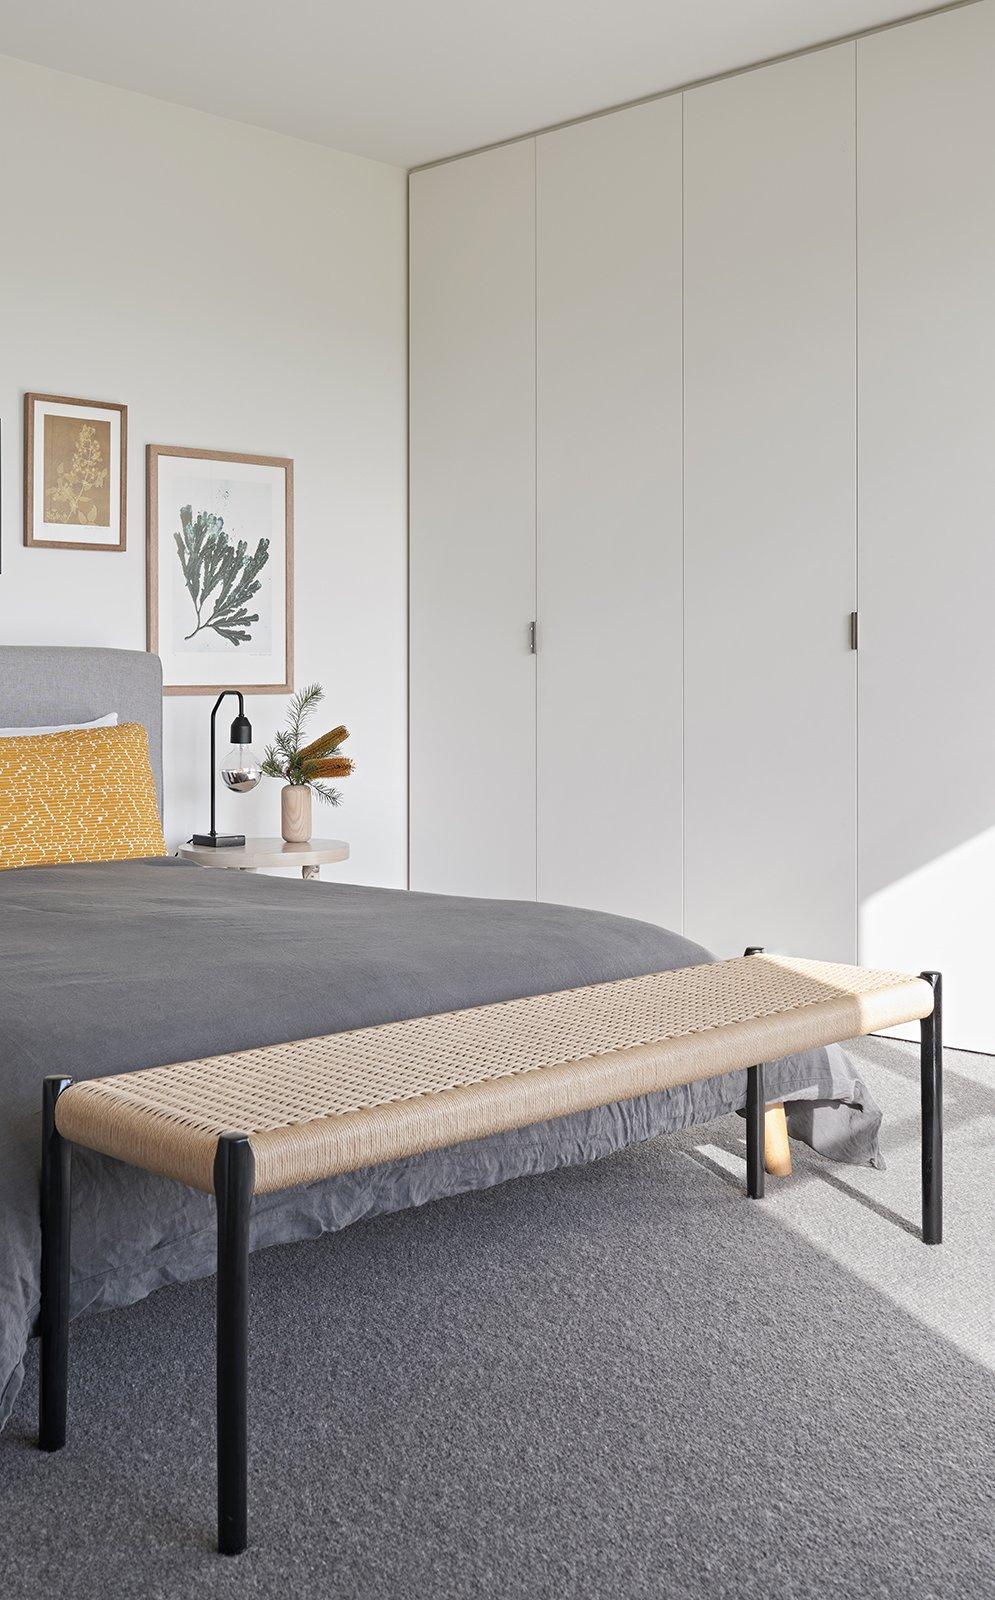 Bedroom, Bed, Carpet Floor, Ceiling Lighting, and Table Lighting  The Balnarring Beach House